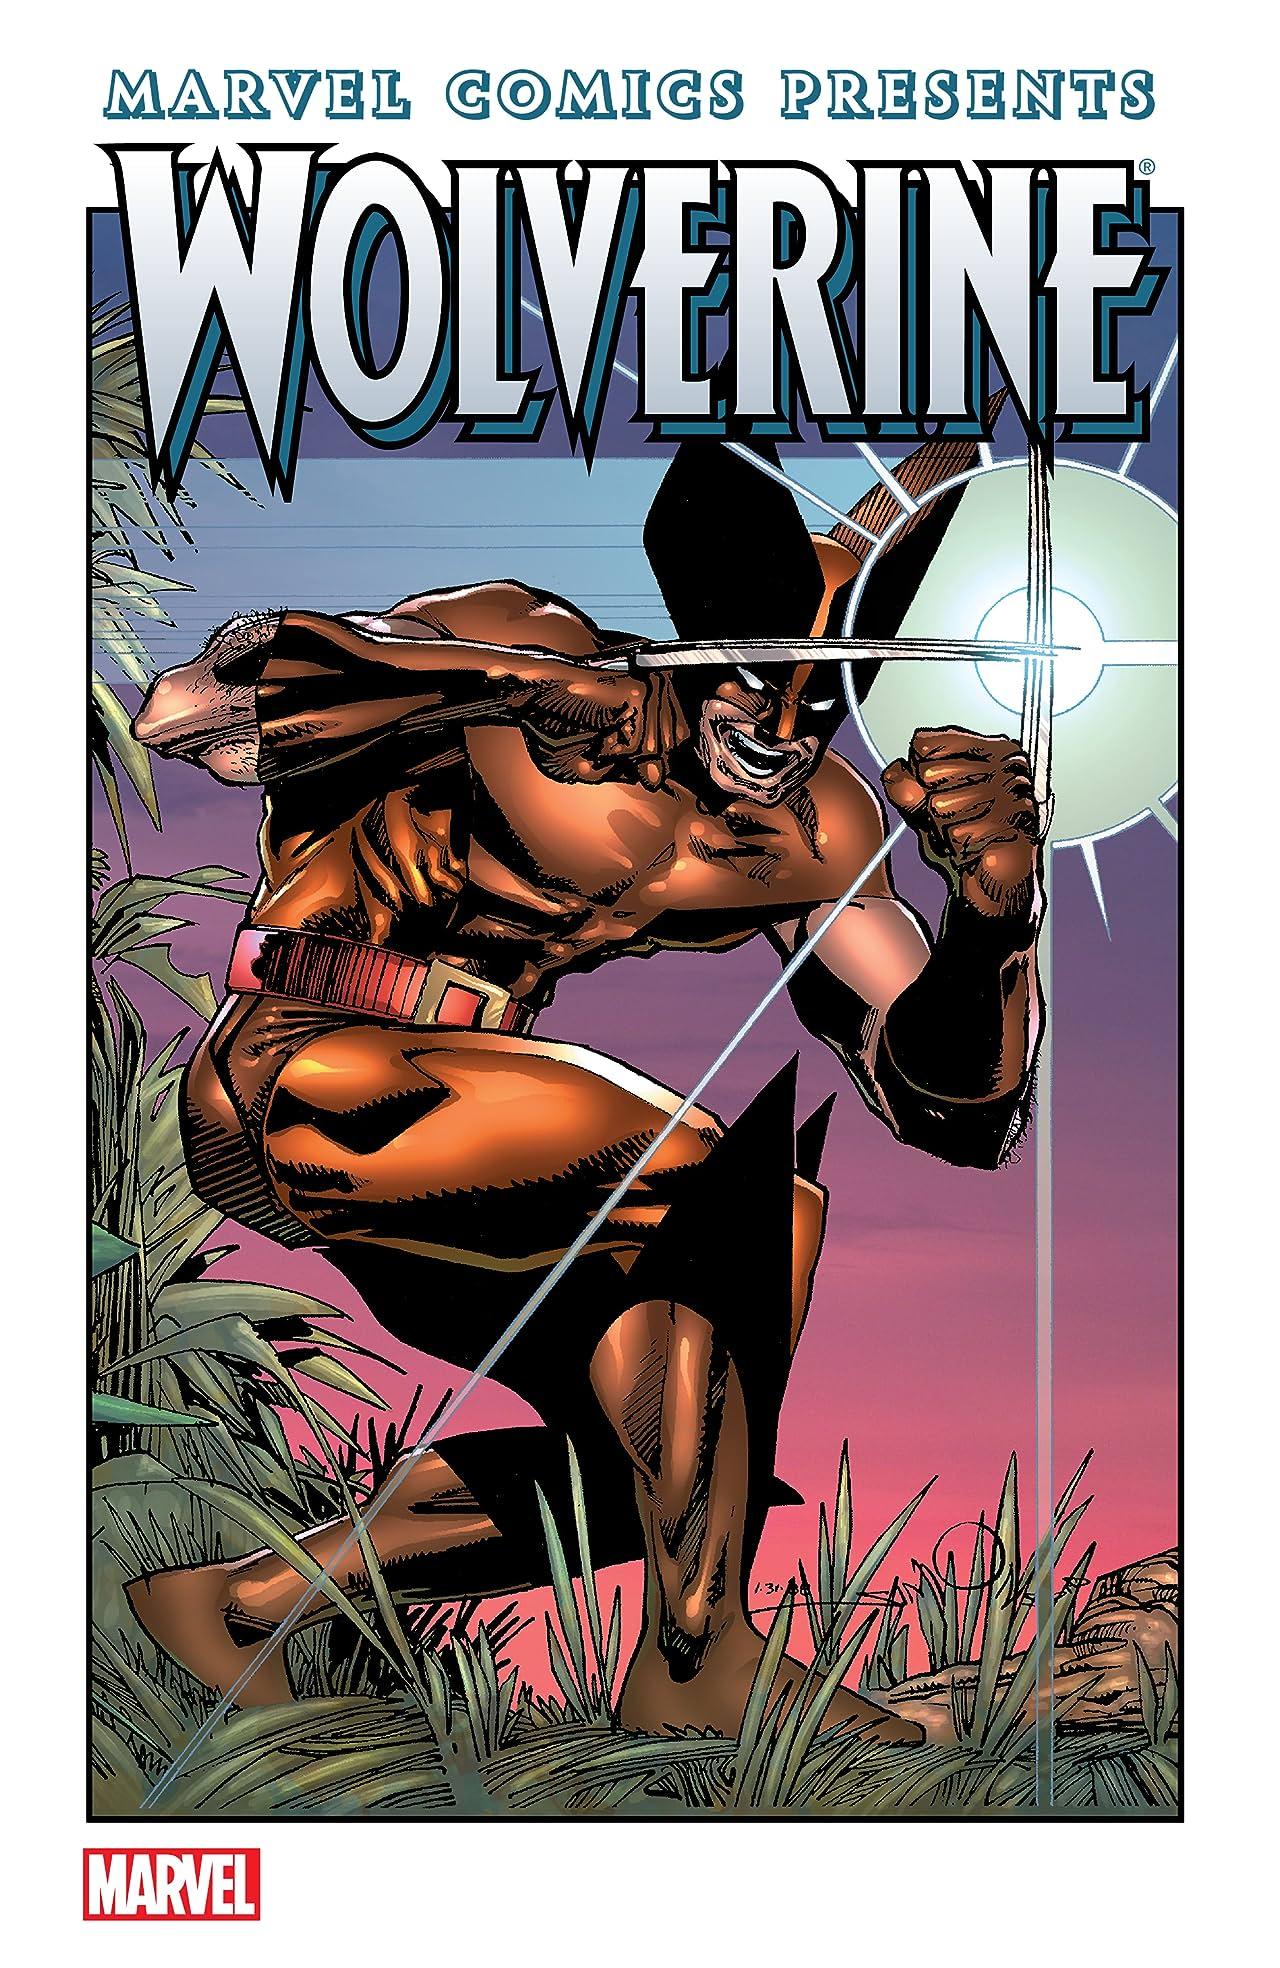 Marvel Comics Presents Wolverine Vol. 1